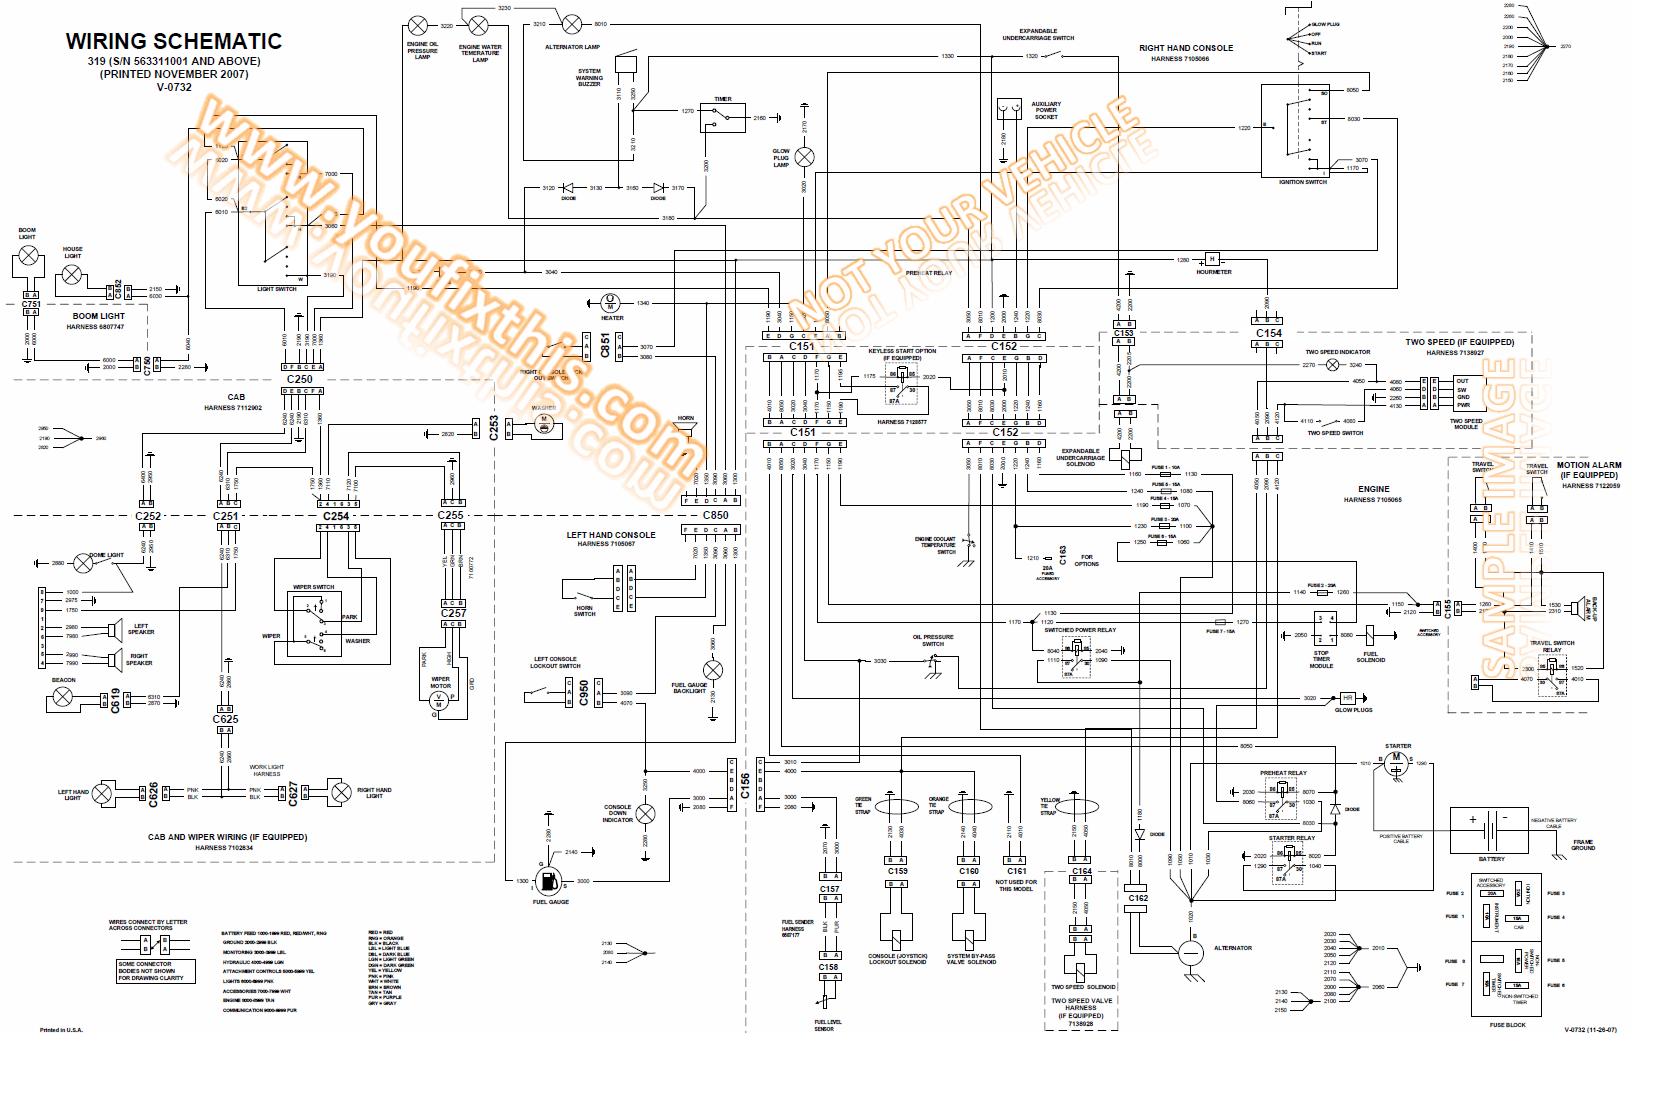 Kubota Rtv 1140 Cpx Wiring Diagram - Go Wiring Diagrams on